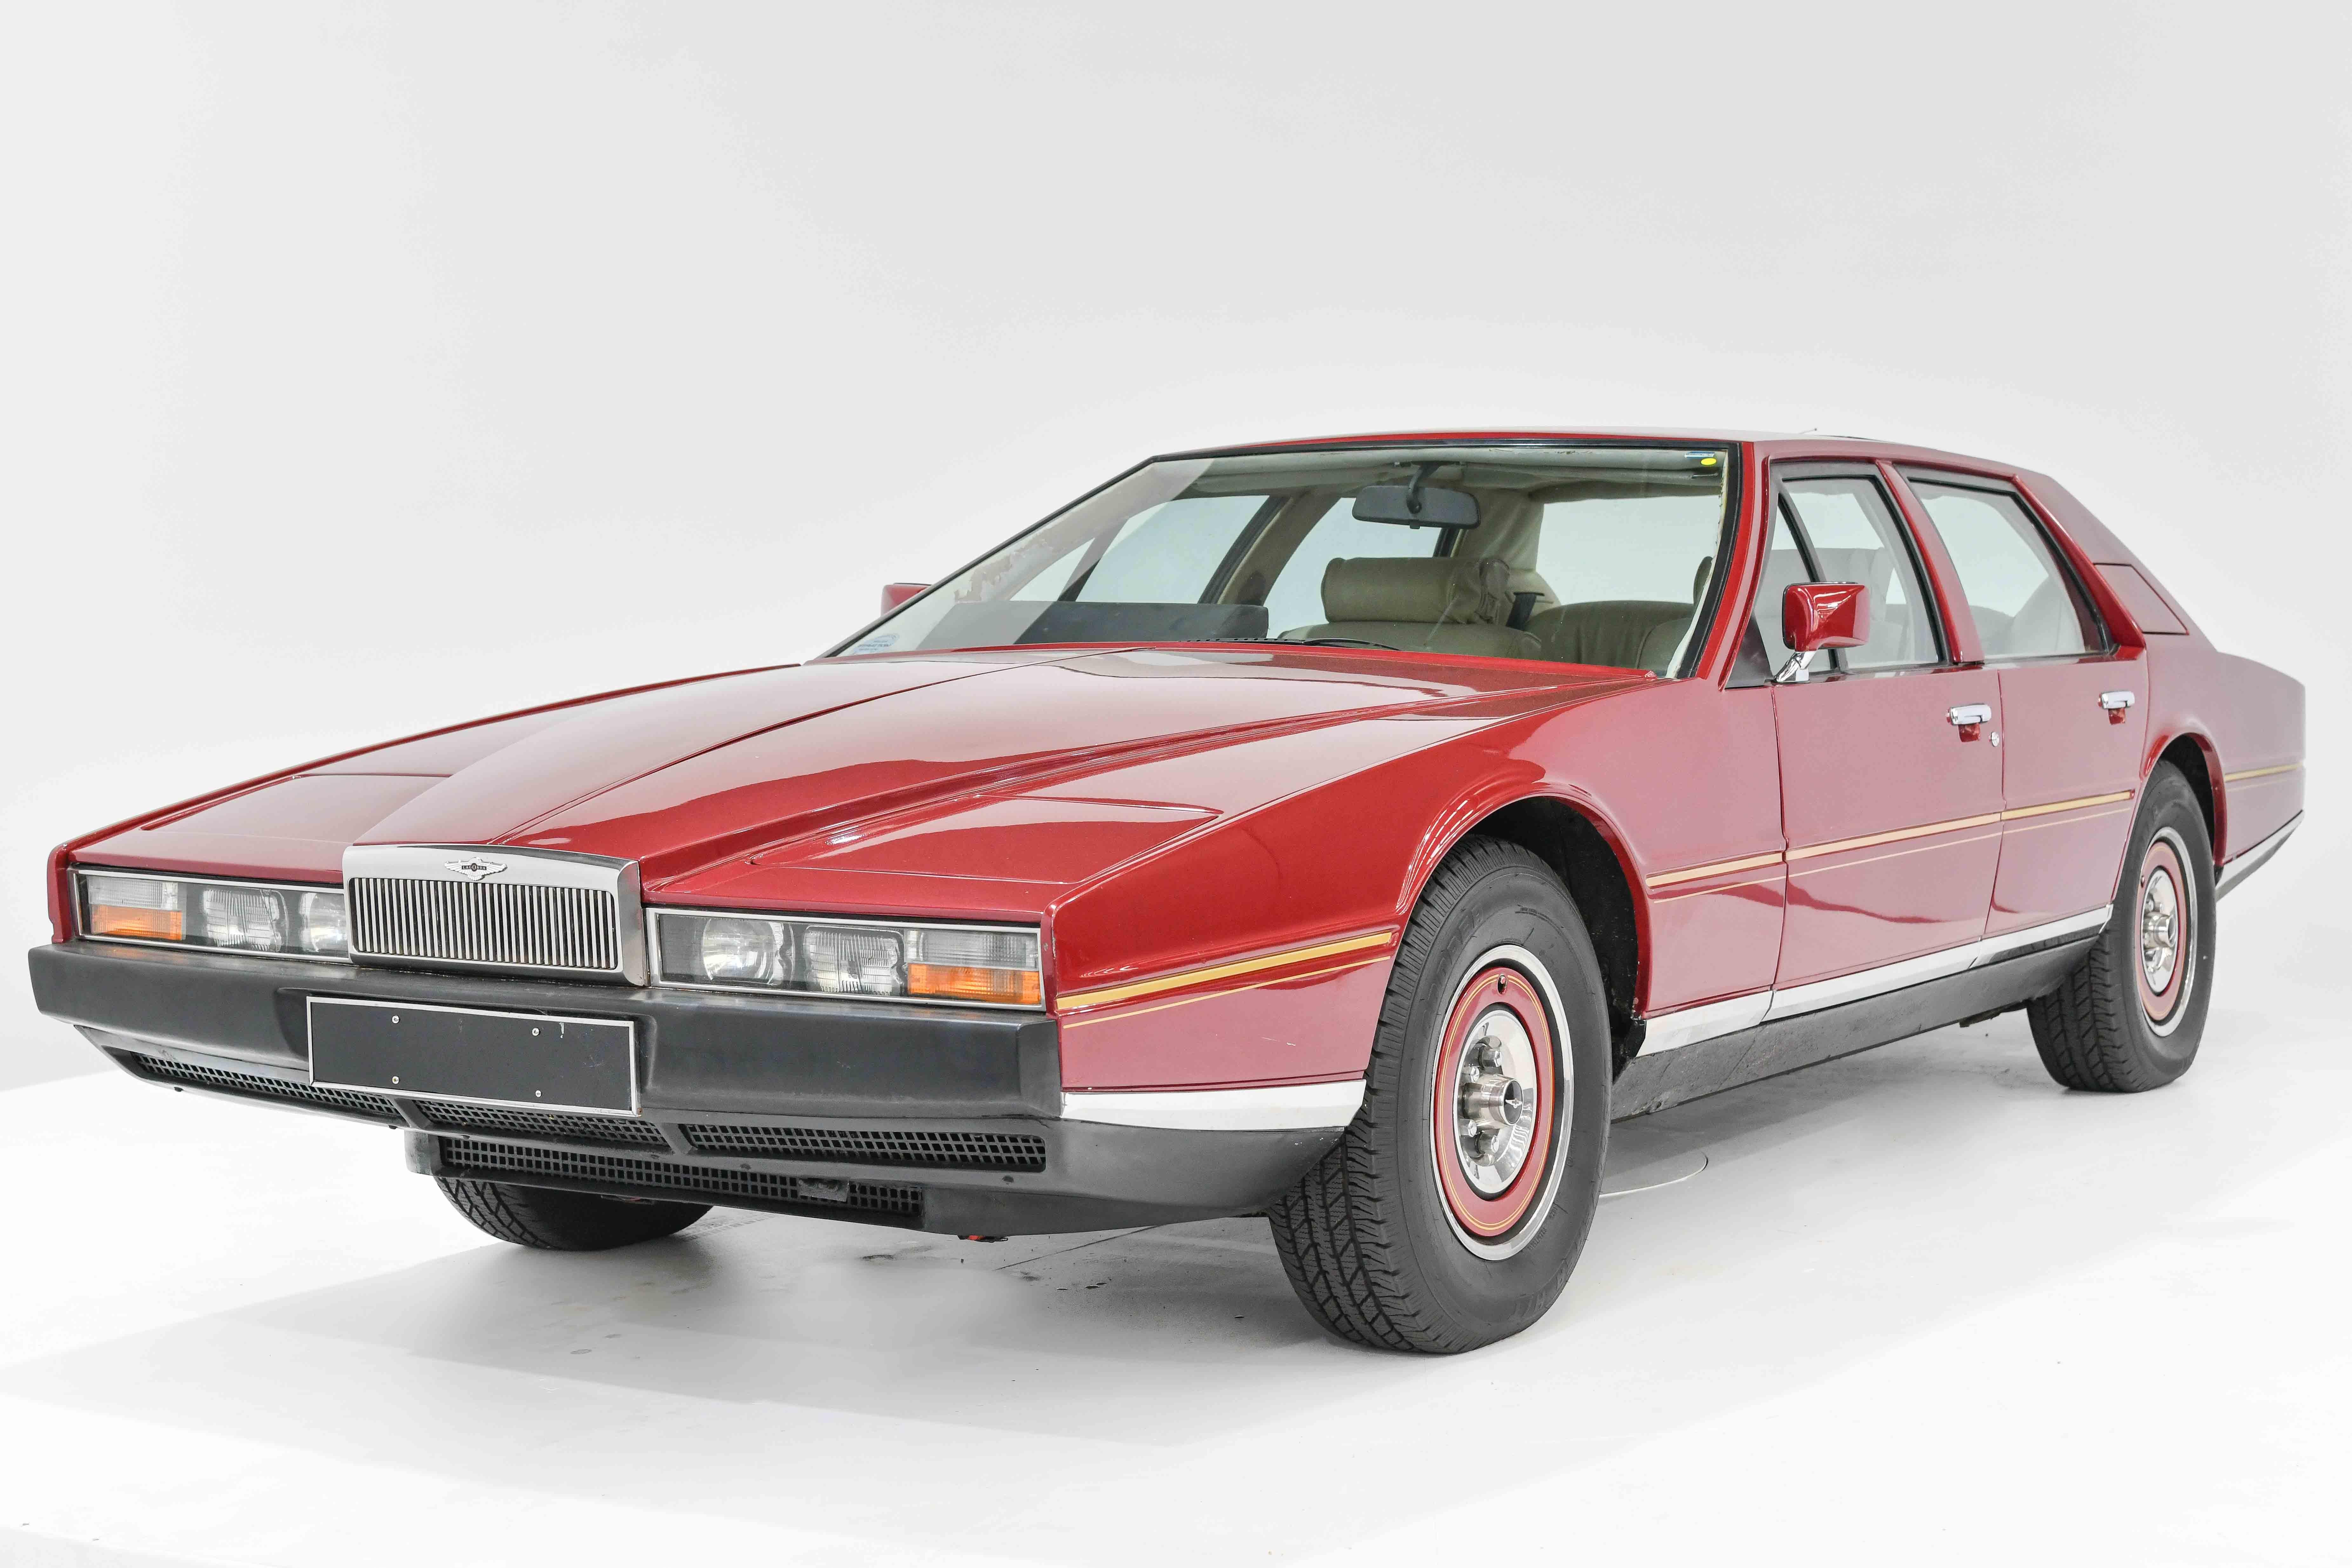 1980 aston martin lagonda - oldtimer zu verkaufen